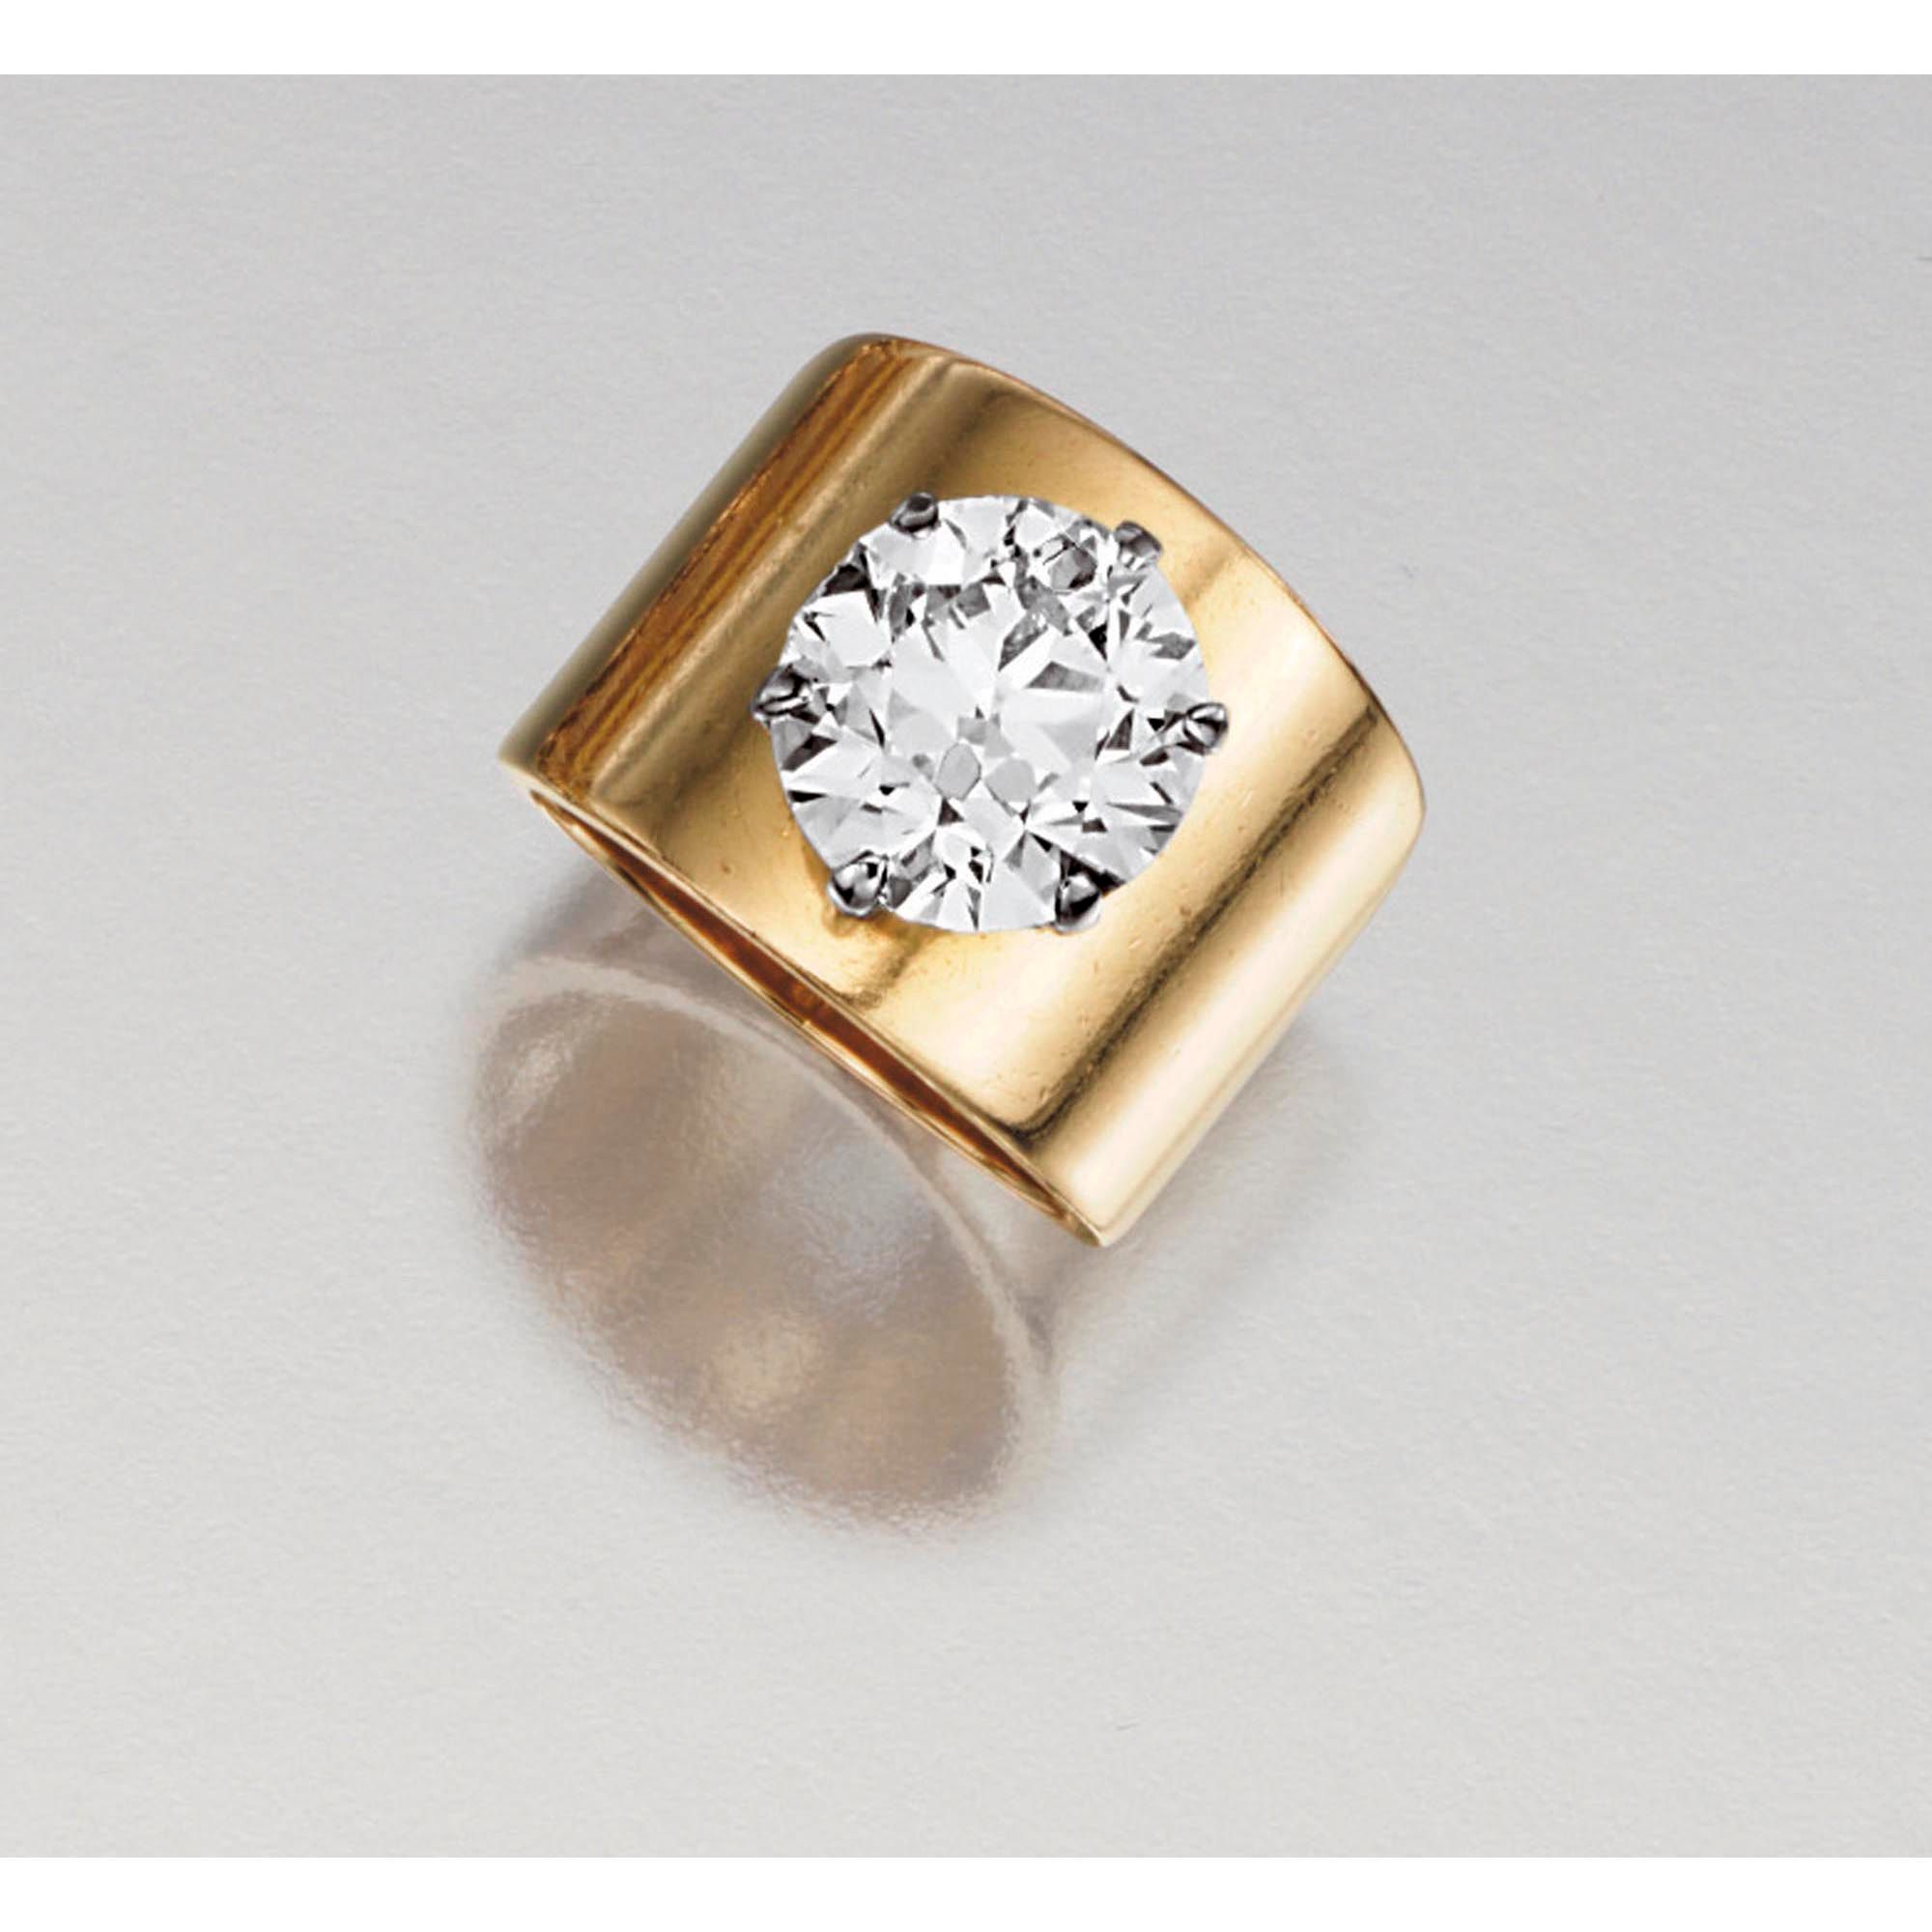 Diamond ring Estimate 38000 50000 CHF 33816 44495USD LOT